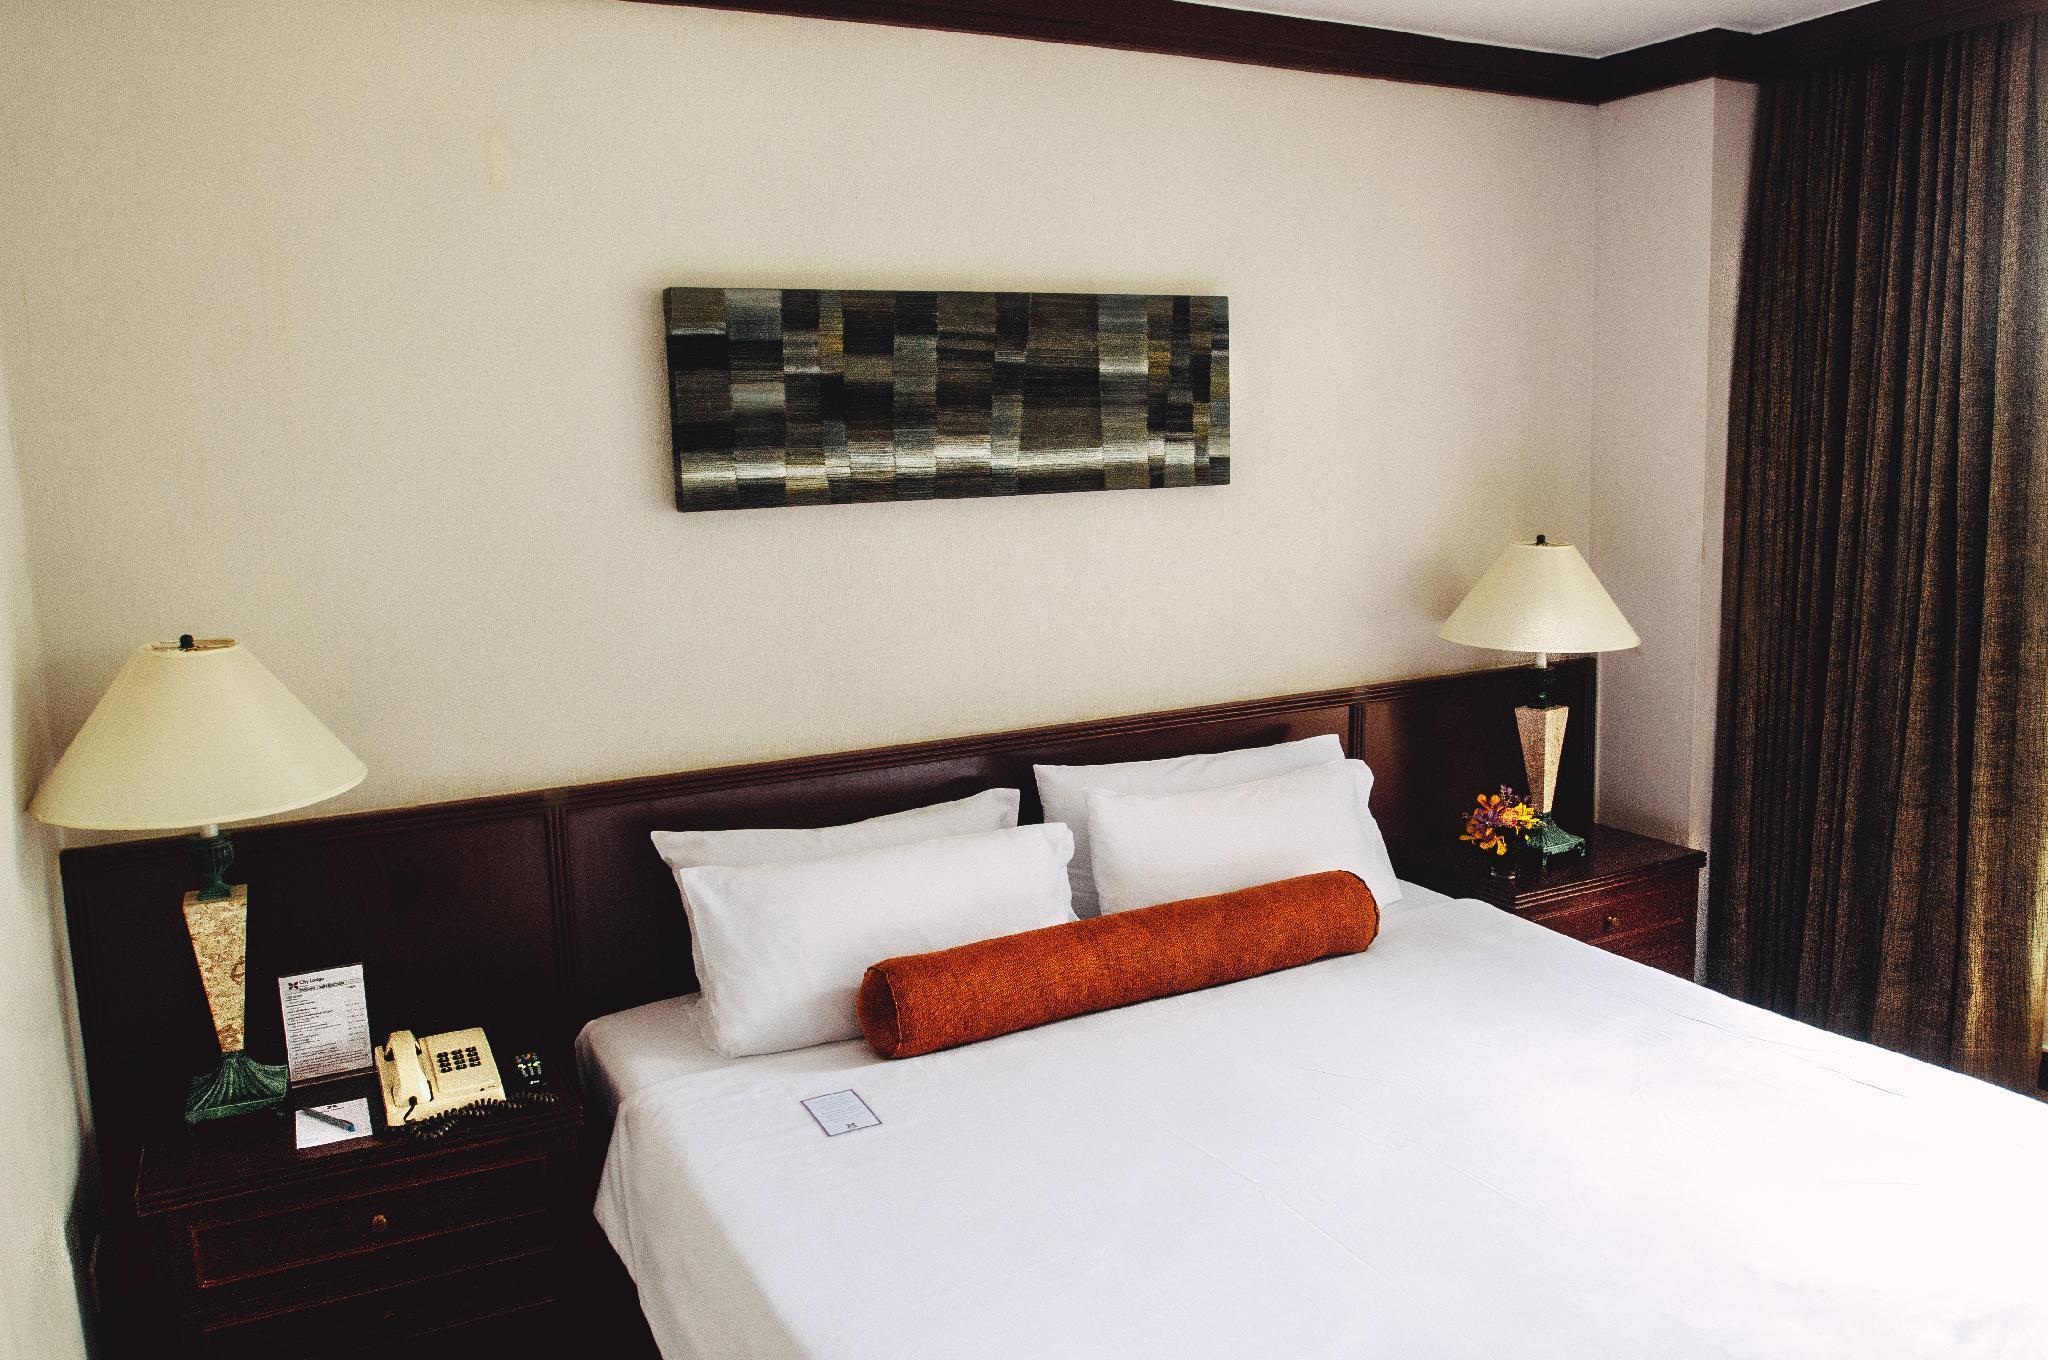 Hotels Near Nana Bts Station Bangkok Best Hotel Rates